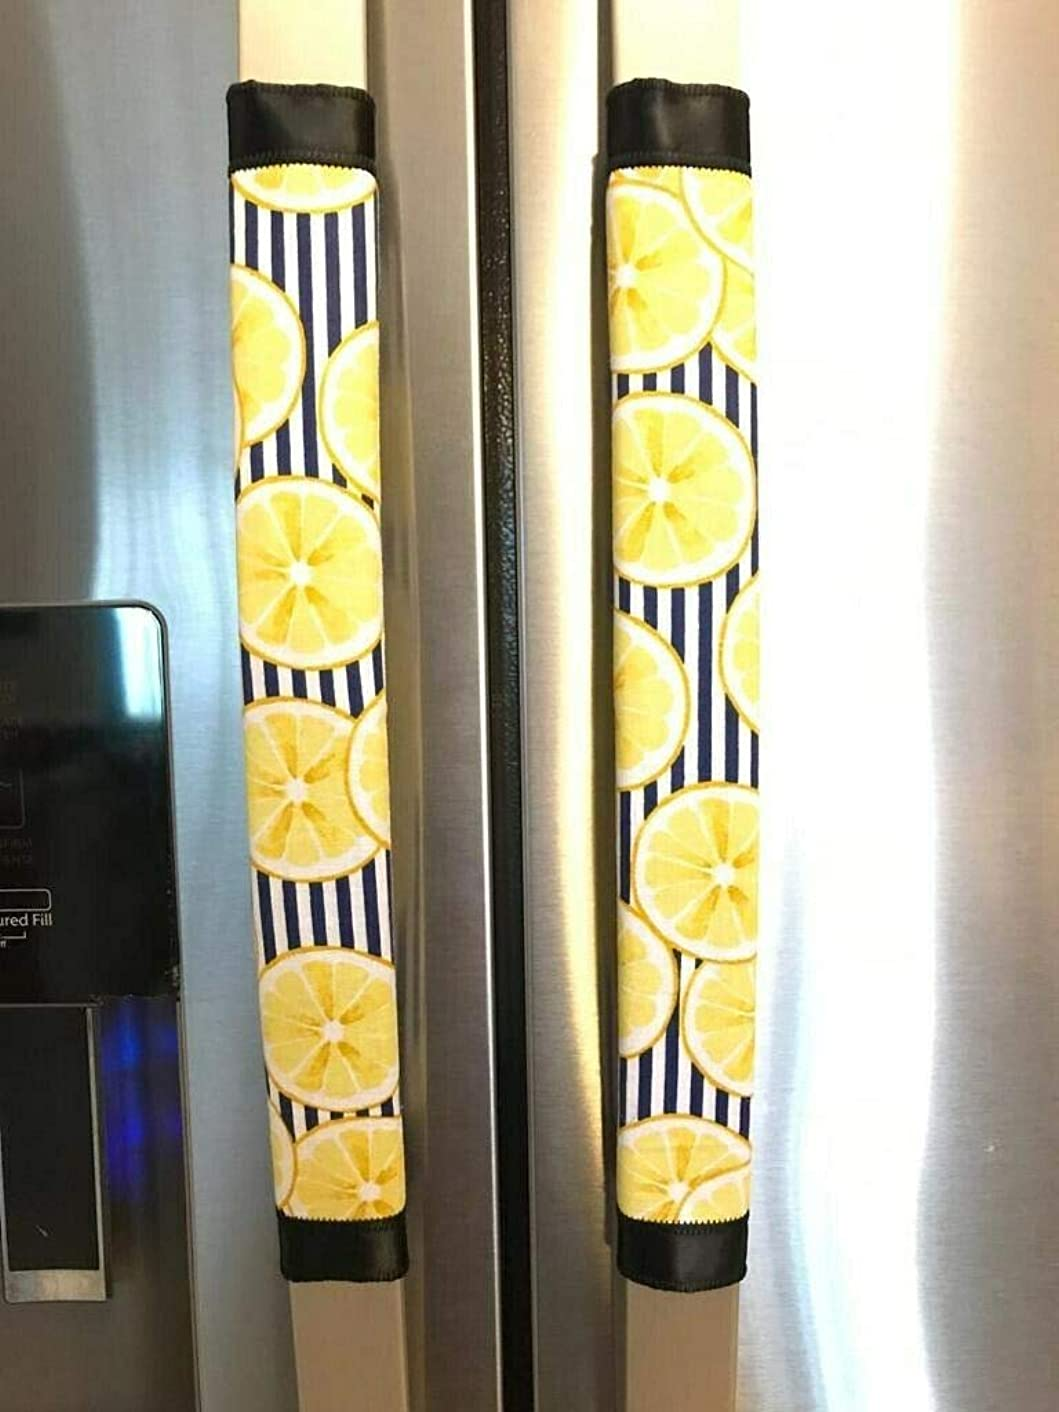 Refrigerator Door Handle Covers Set of Two Lemon Theme 13 Long X 5 Wide